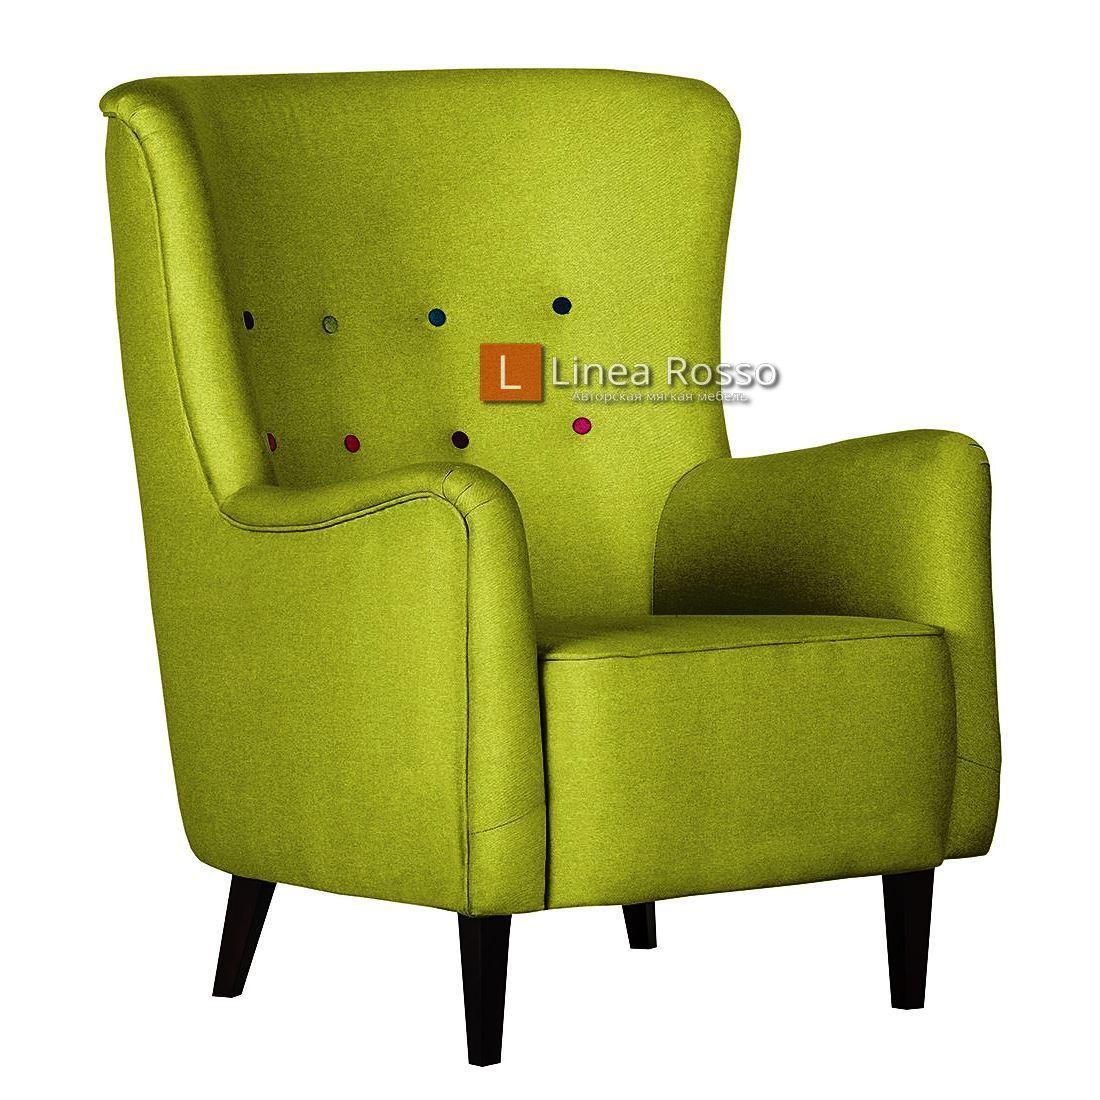 salatovoe kreslo1 - Кресло в салатовом цвете на заказ